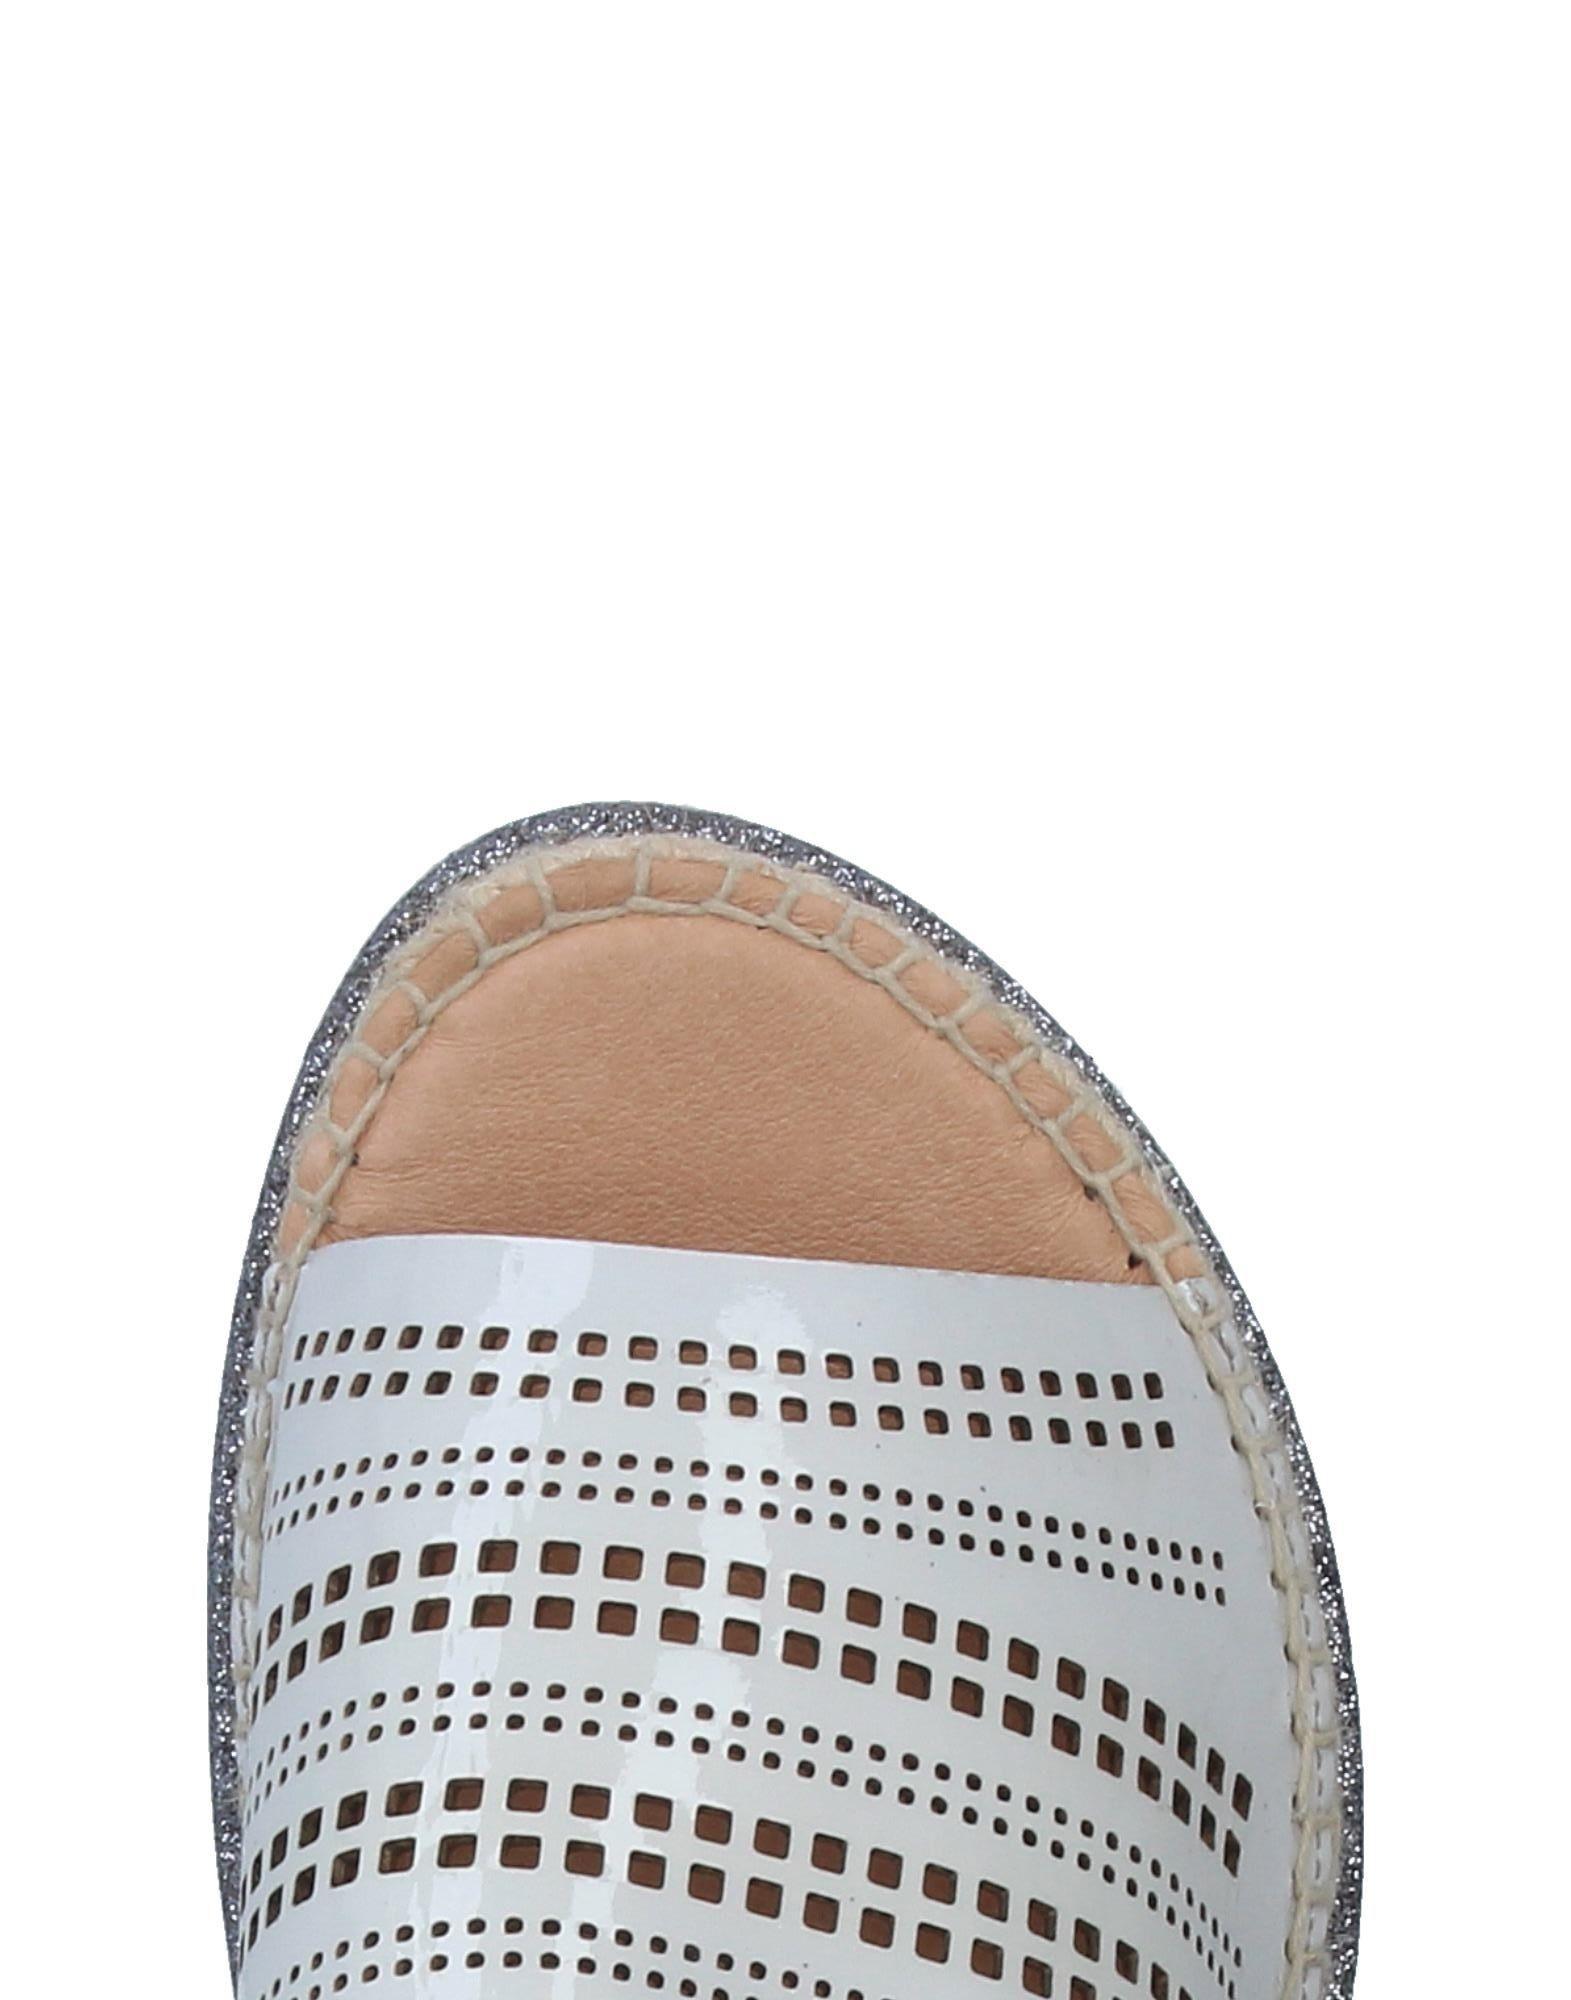 Sandales Kanna Femme - Sandales Kanna sur